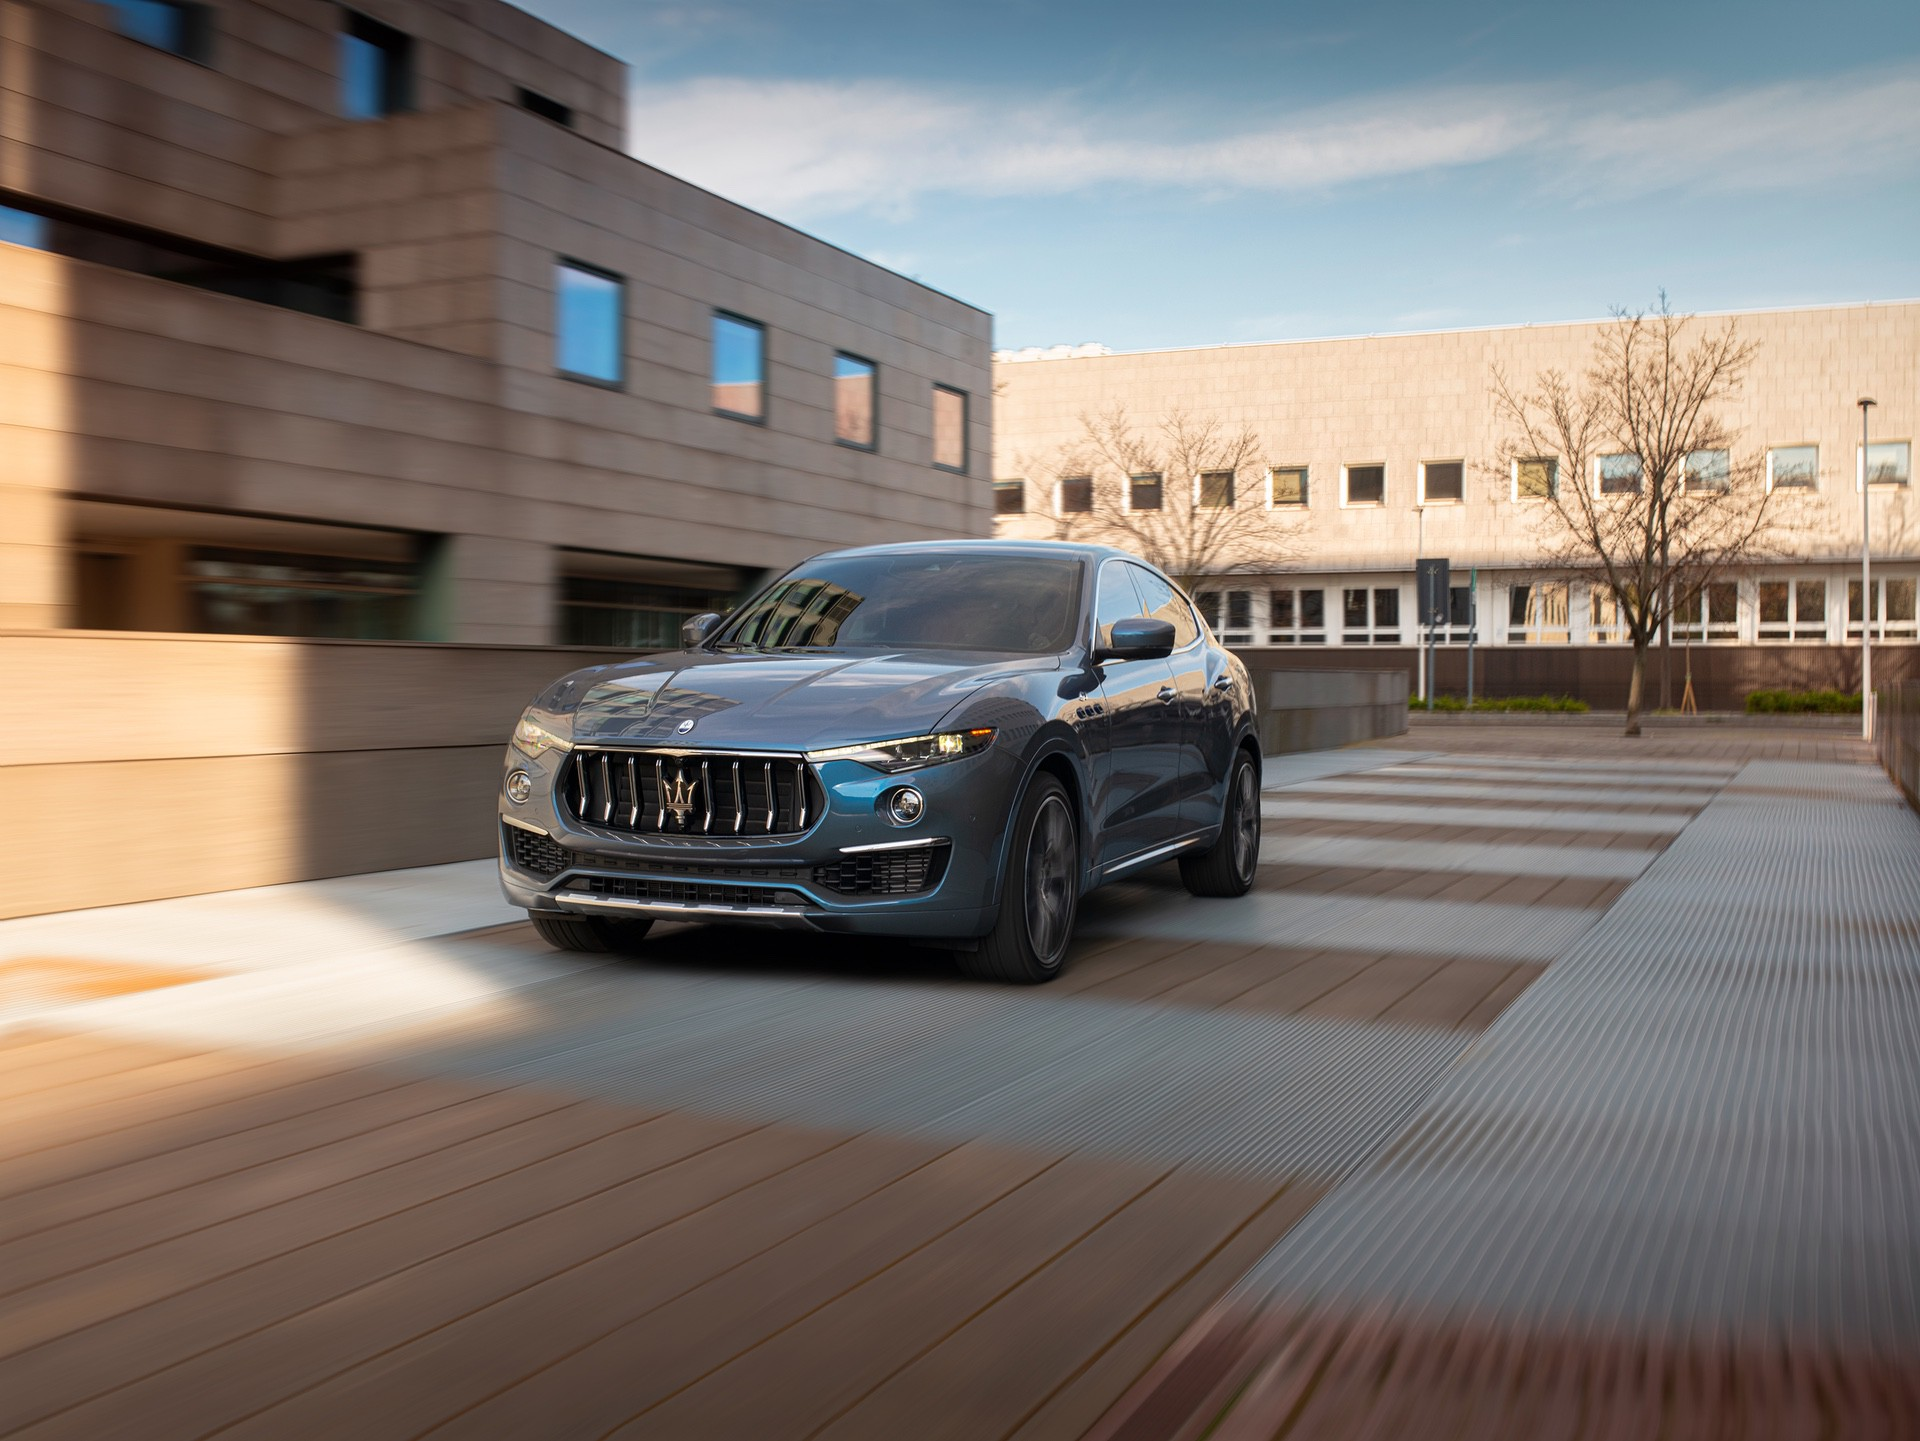 2022_Maserati_Levante_Hybrid-0017